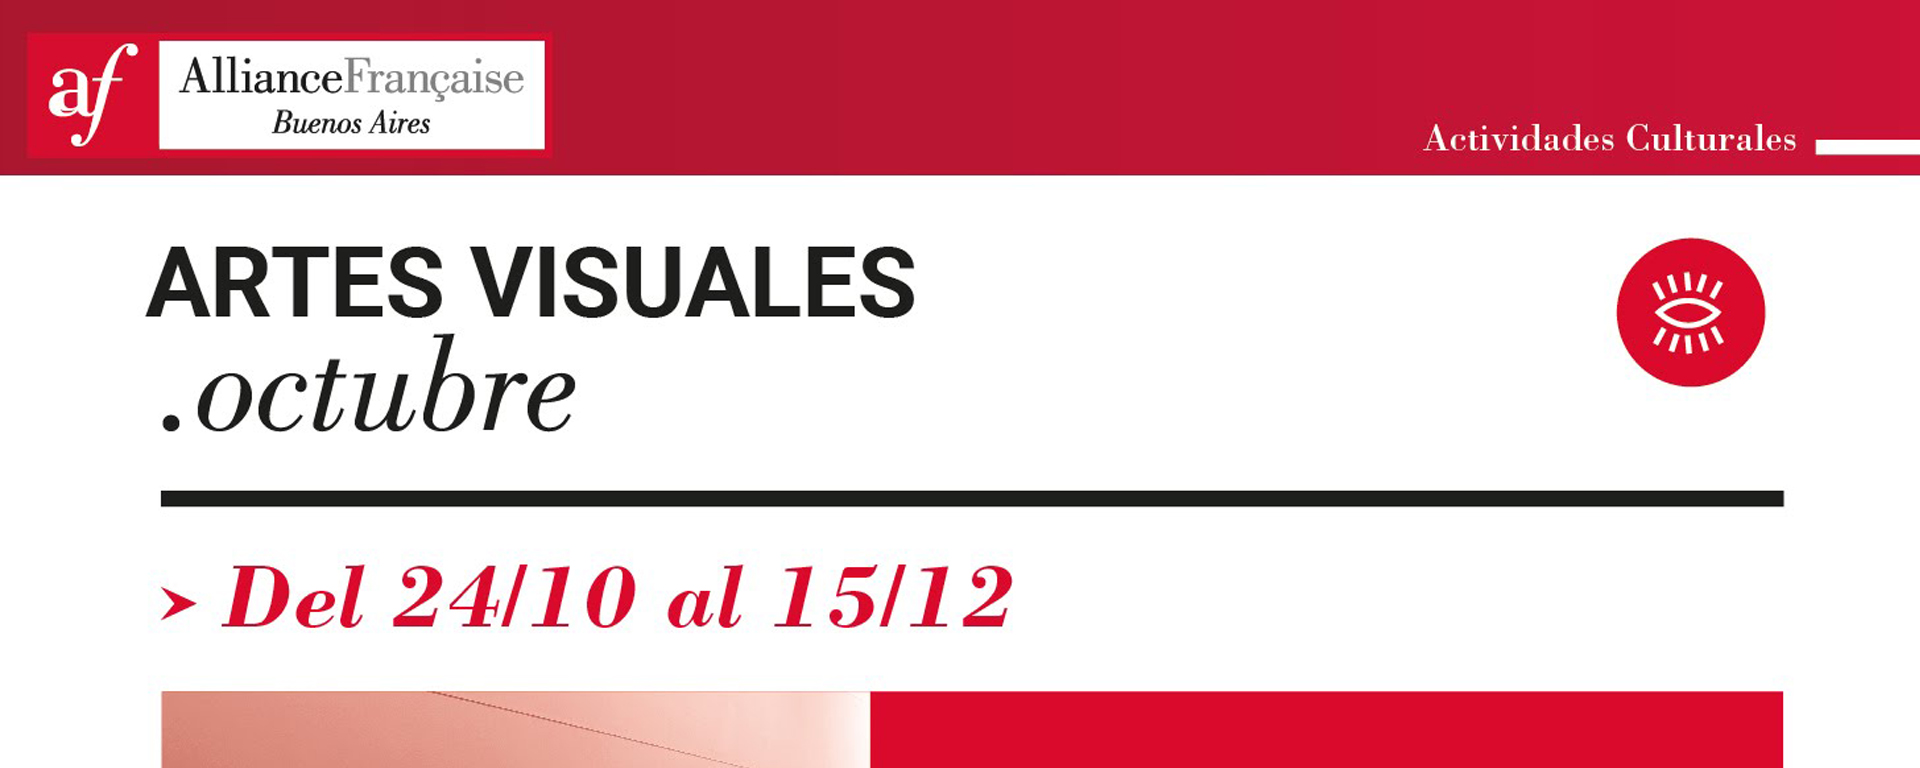 Convocatoria 2018 - Artes Visuales